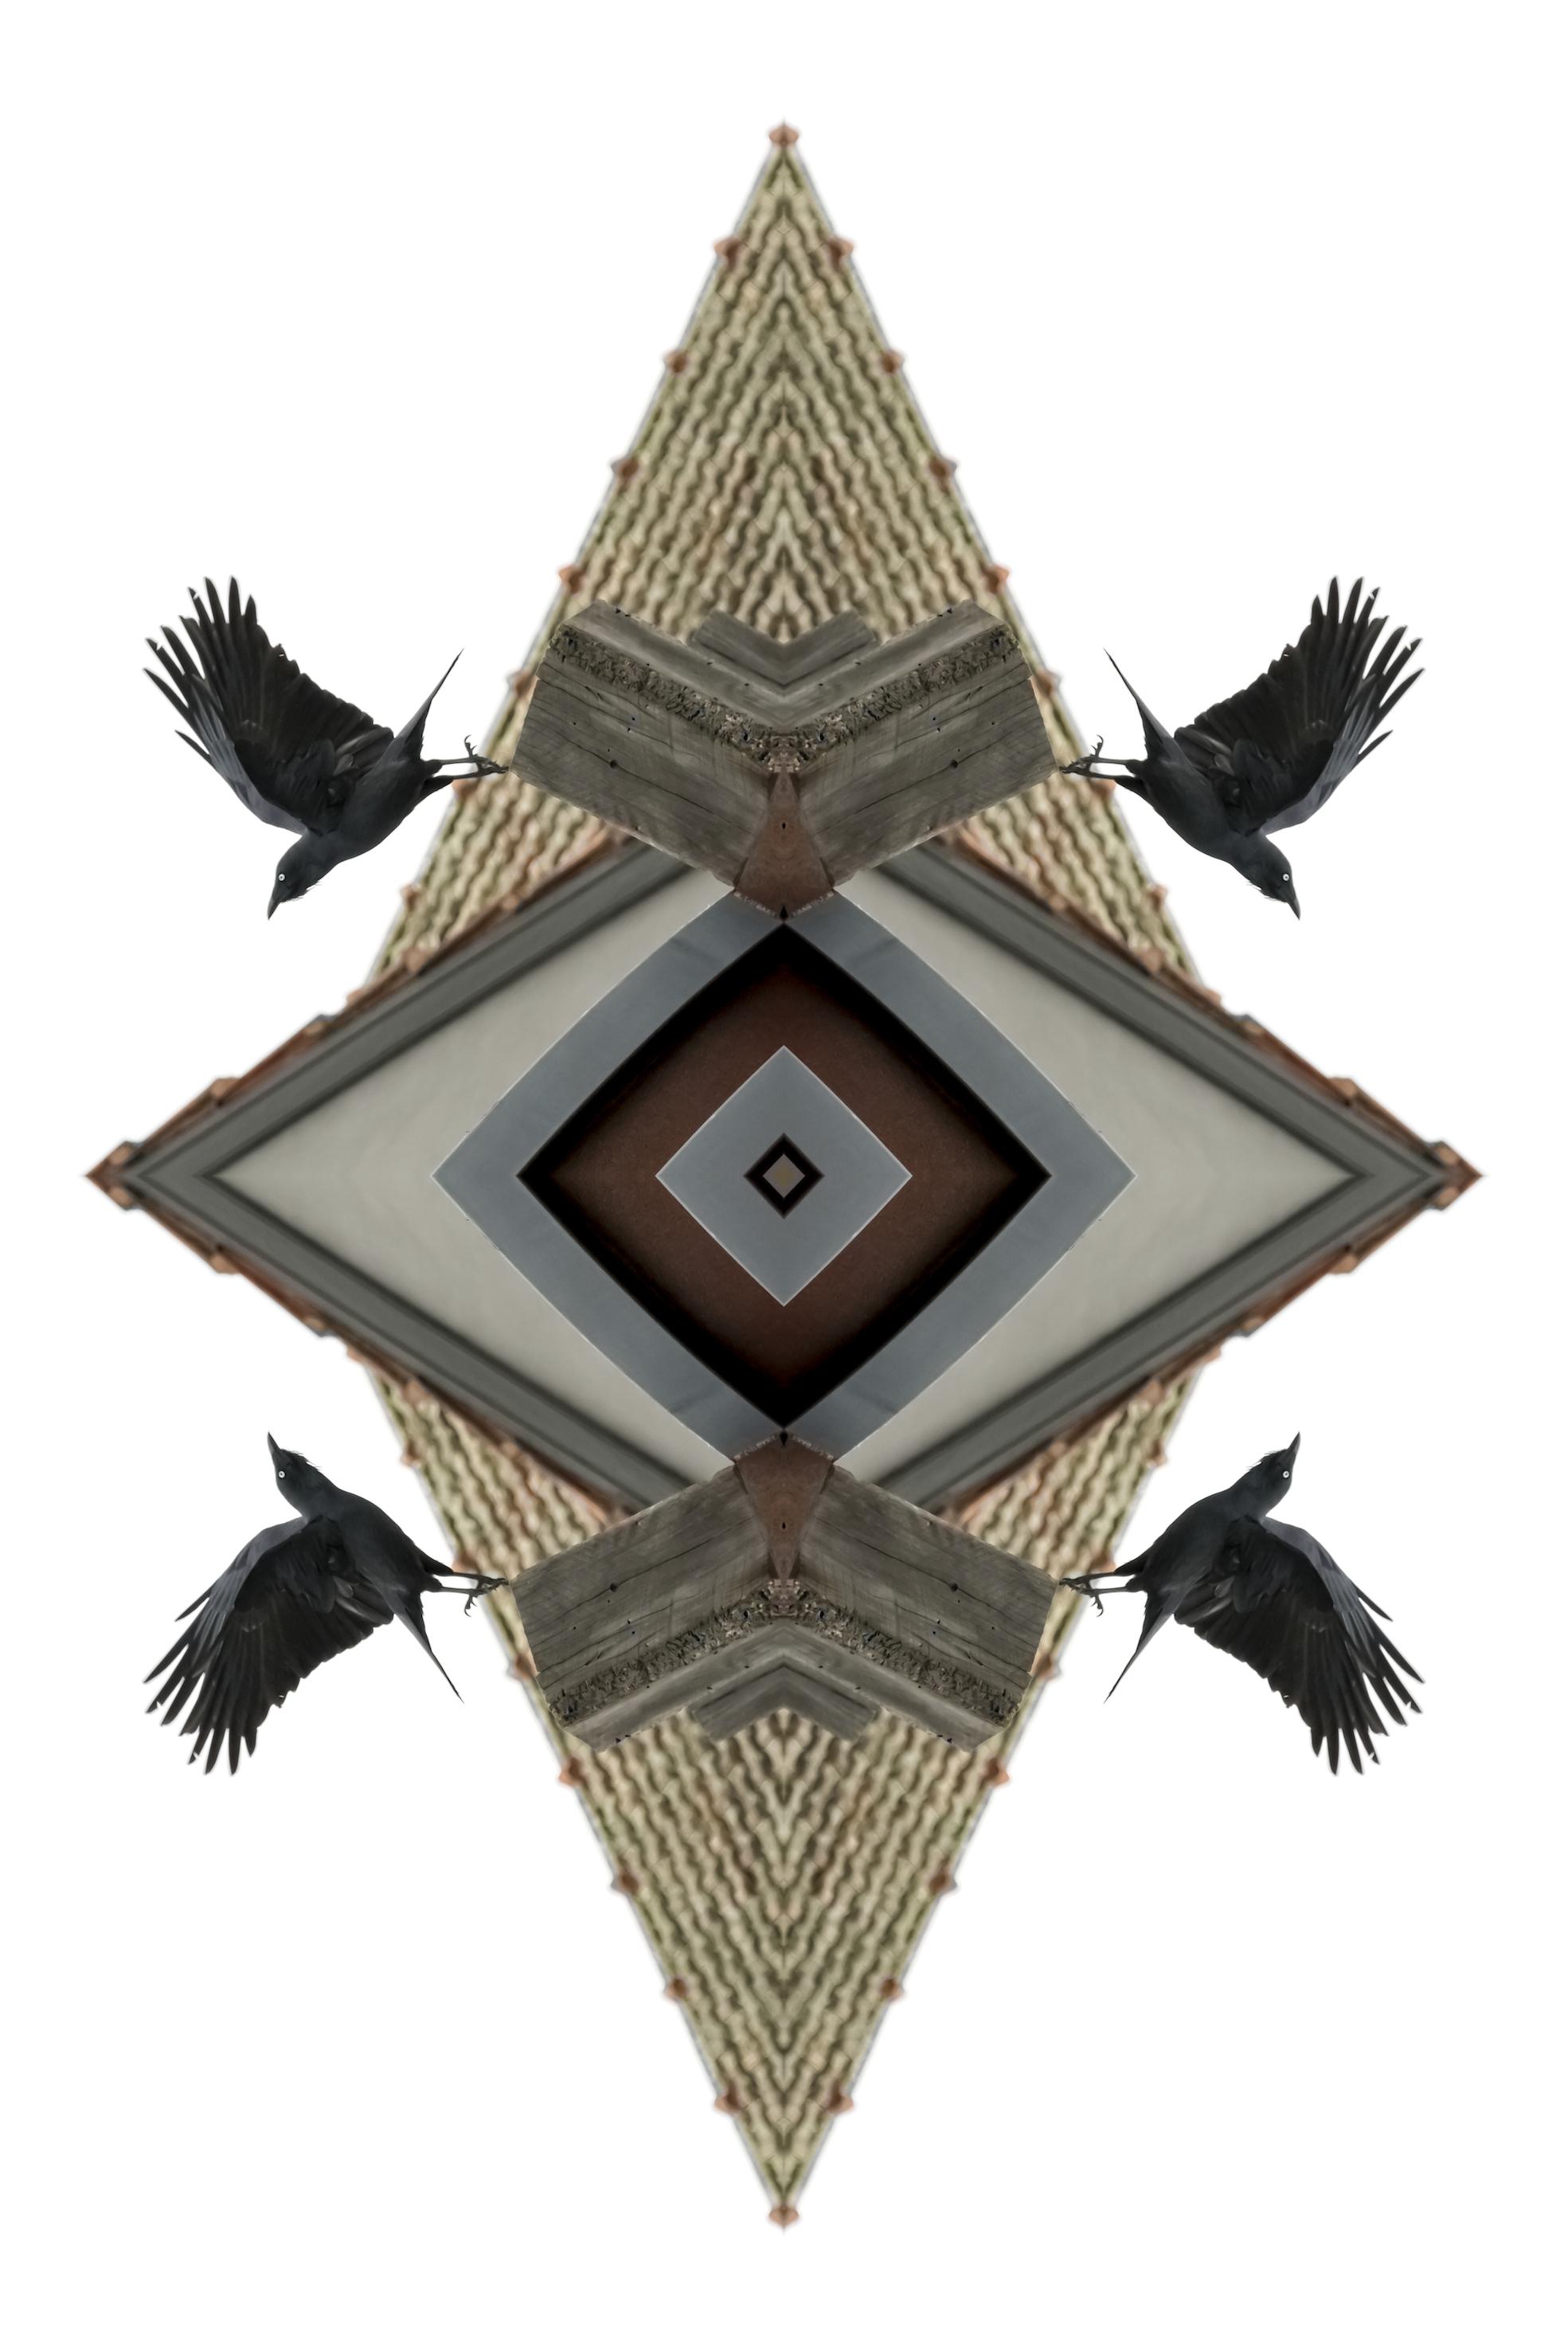 Crow,  2017  Archival print on cotton rag paper  150 x 100 cm